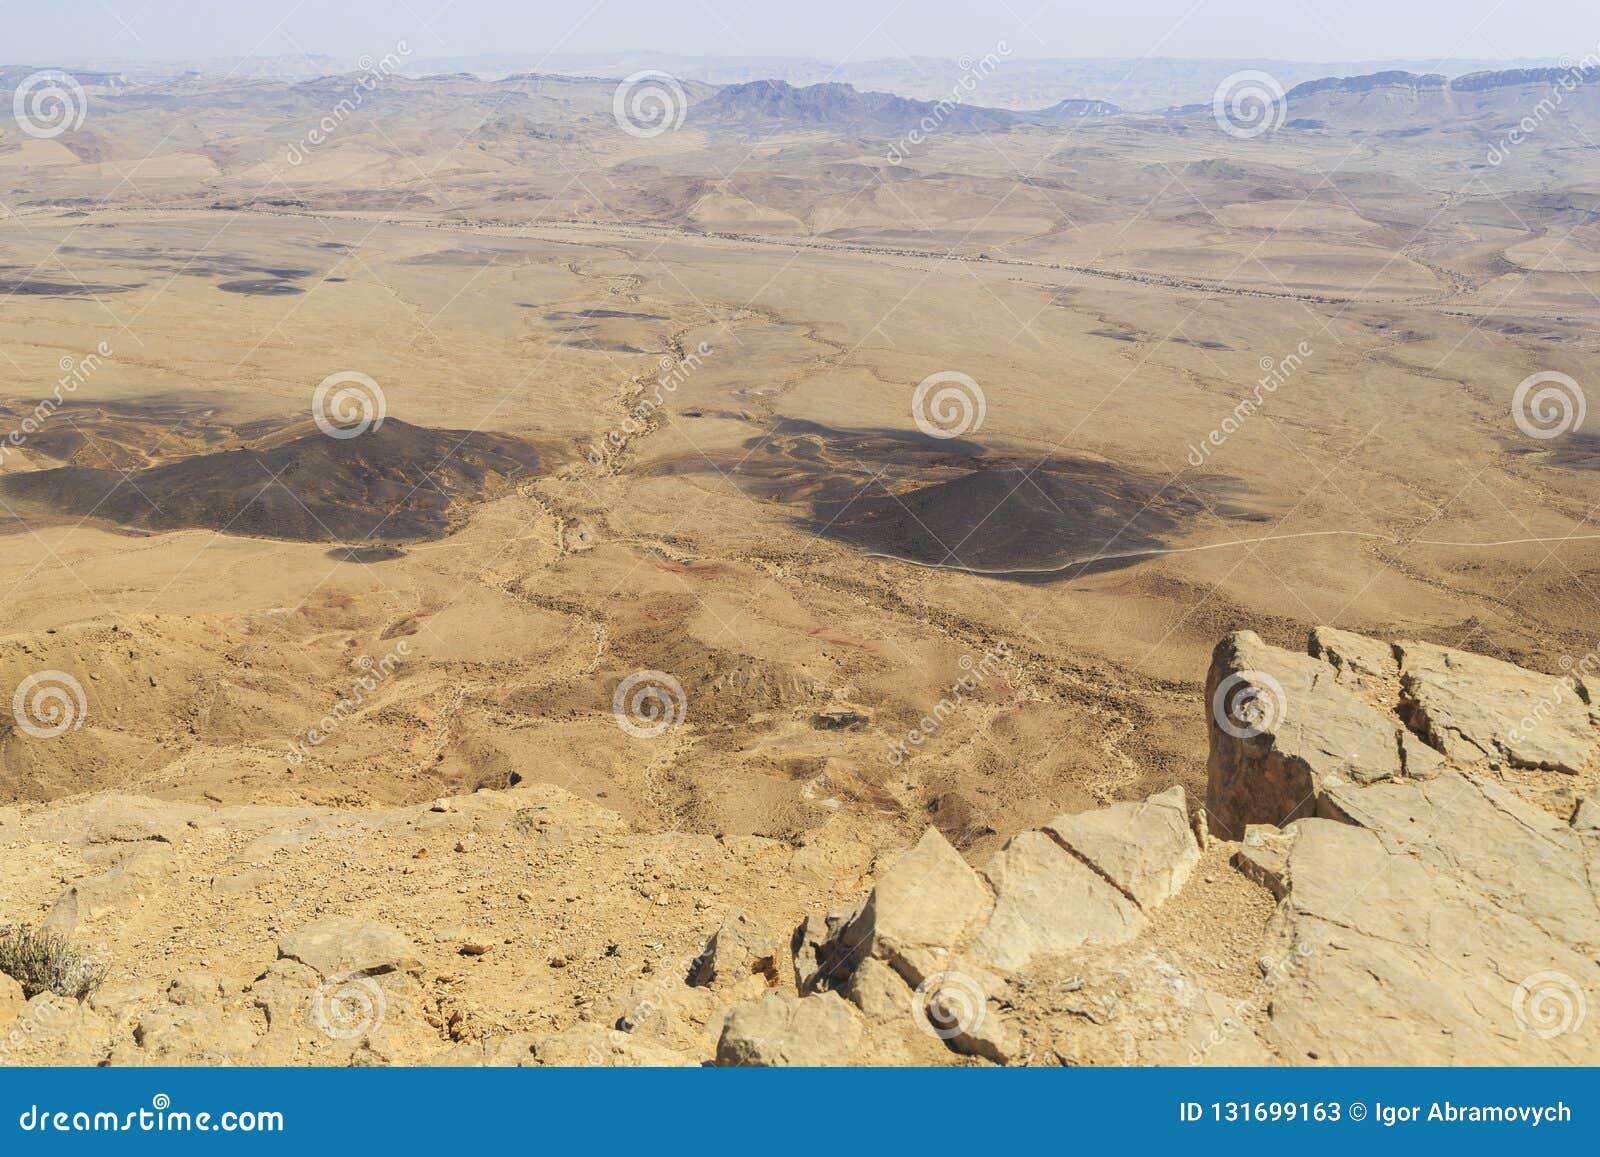 Crater Ramon in the Negev desert, Israel